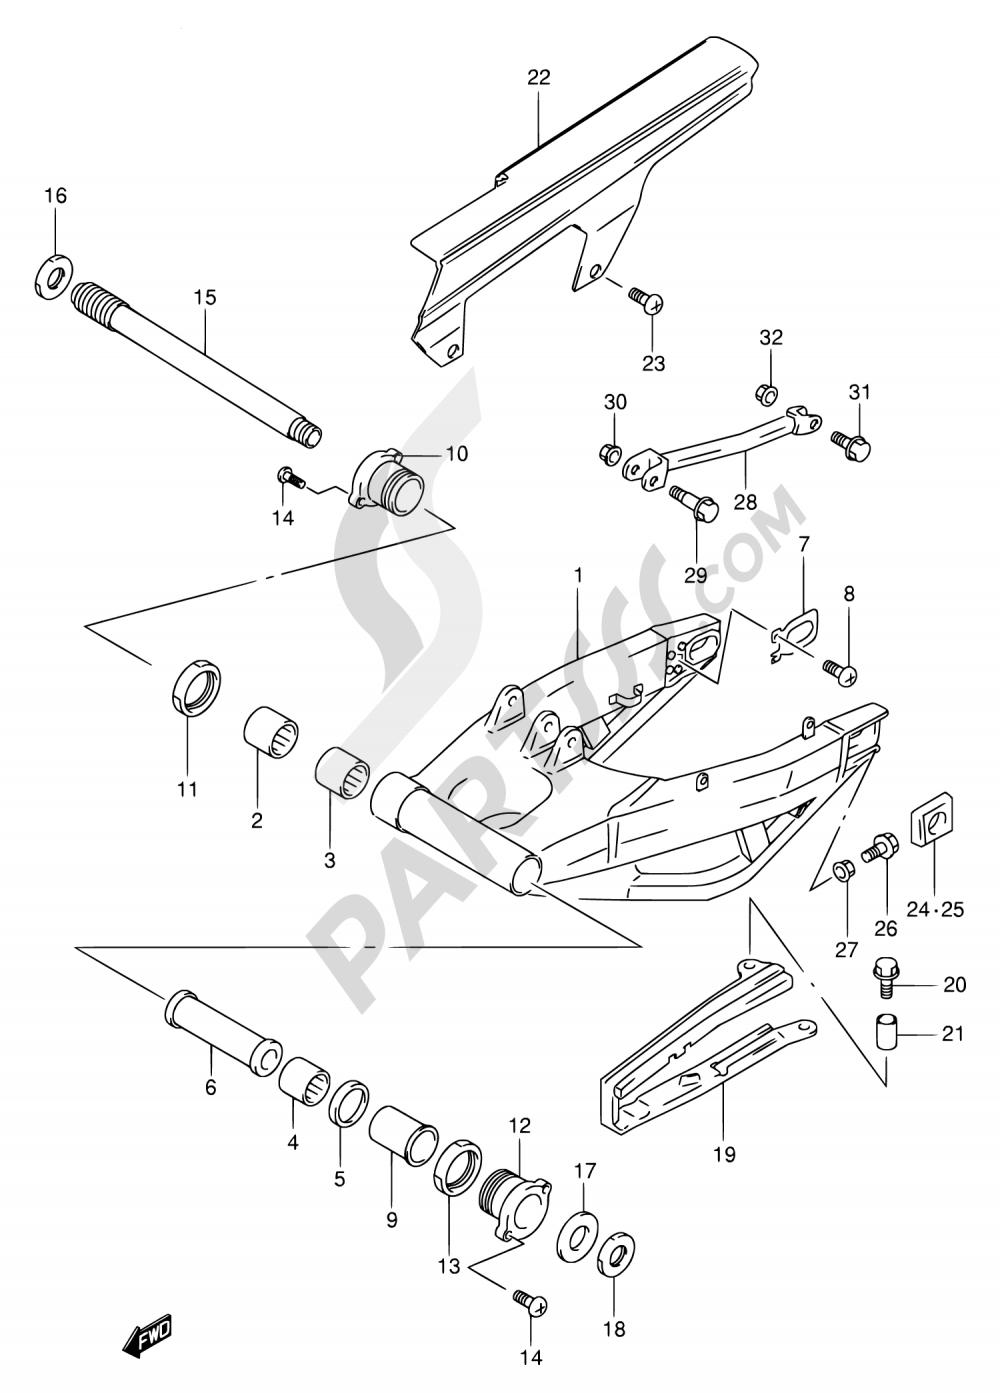 56 - REAR SWINGING ARM Suzuki TL1000R 1998